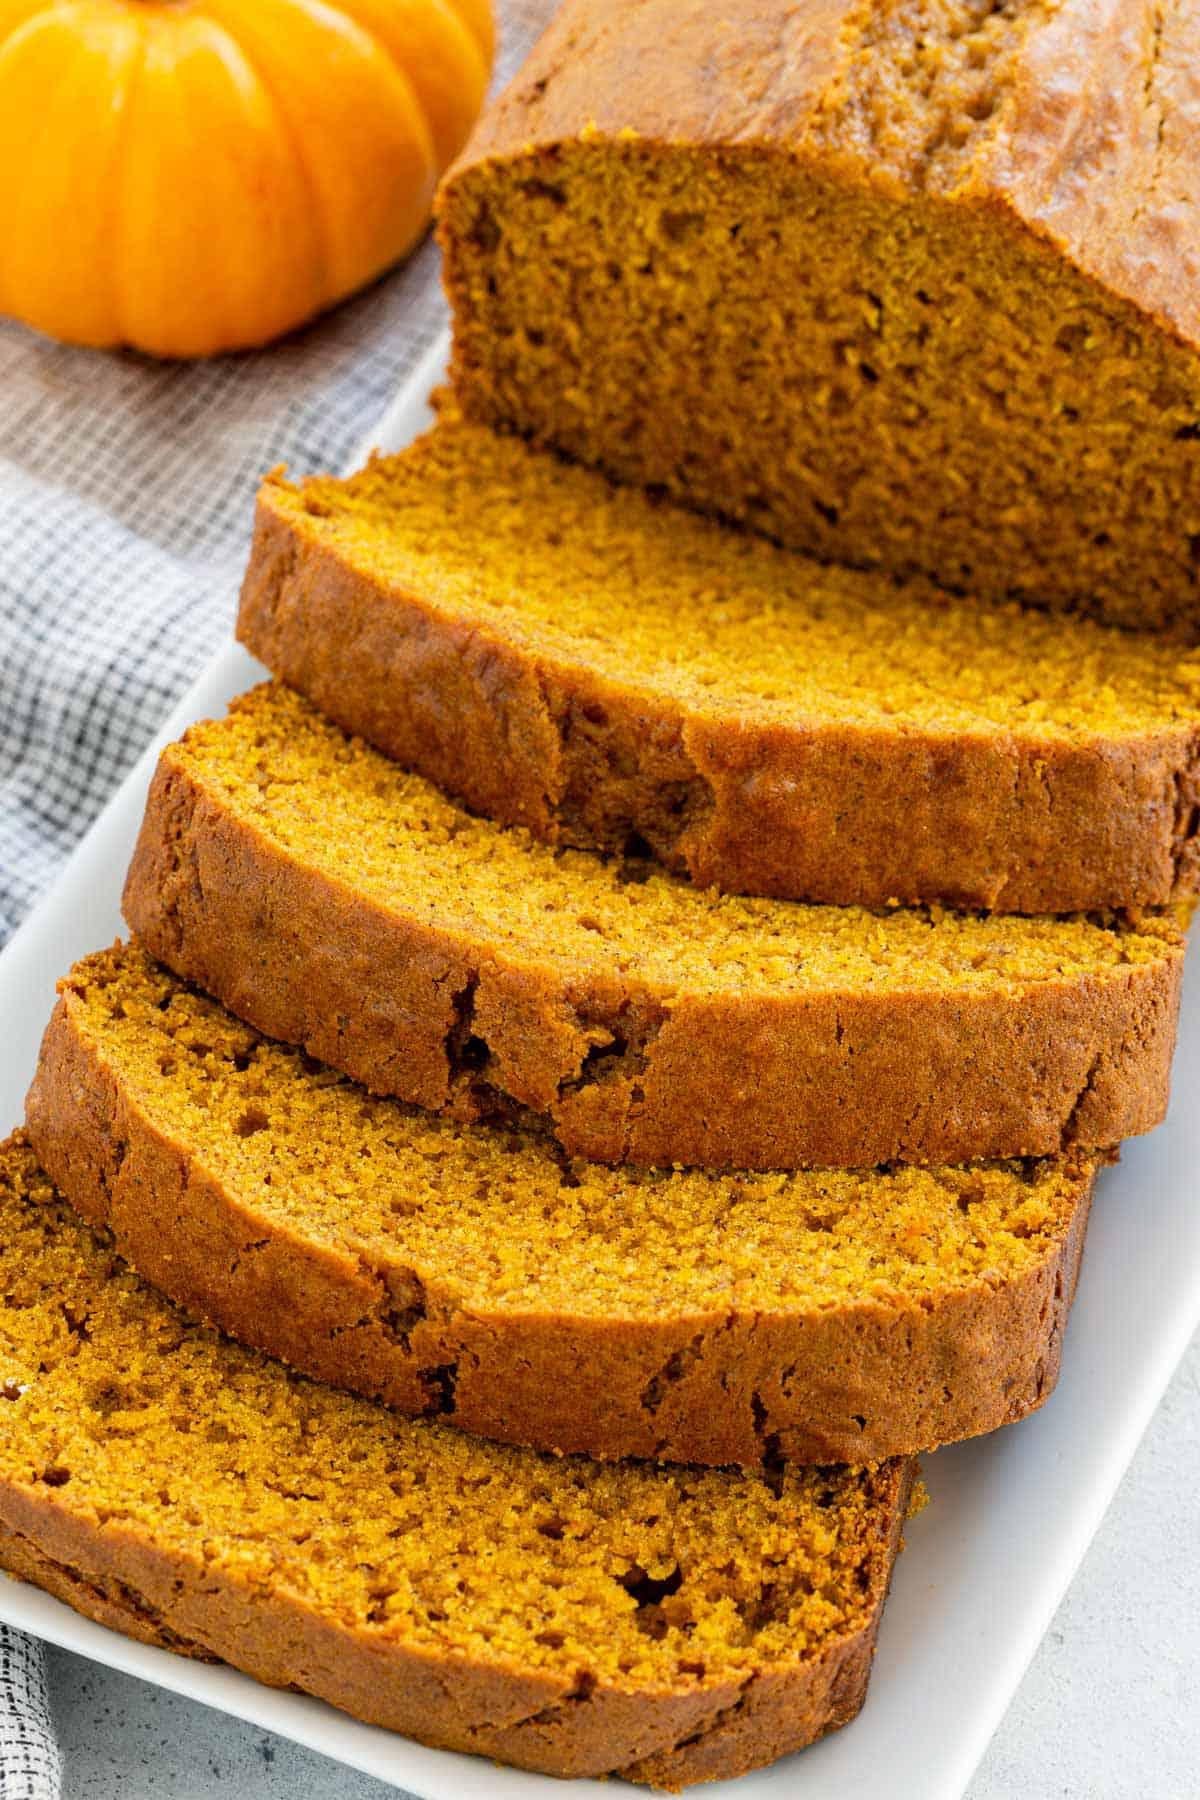 Easy pumpkin bread recipe made with pumpkin puree, dark brown sugar, sour cream, and little cornstarch. A tender quick-bread with beautiful dome top. #pumpkinbread #pumpkinrecipe #bread